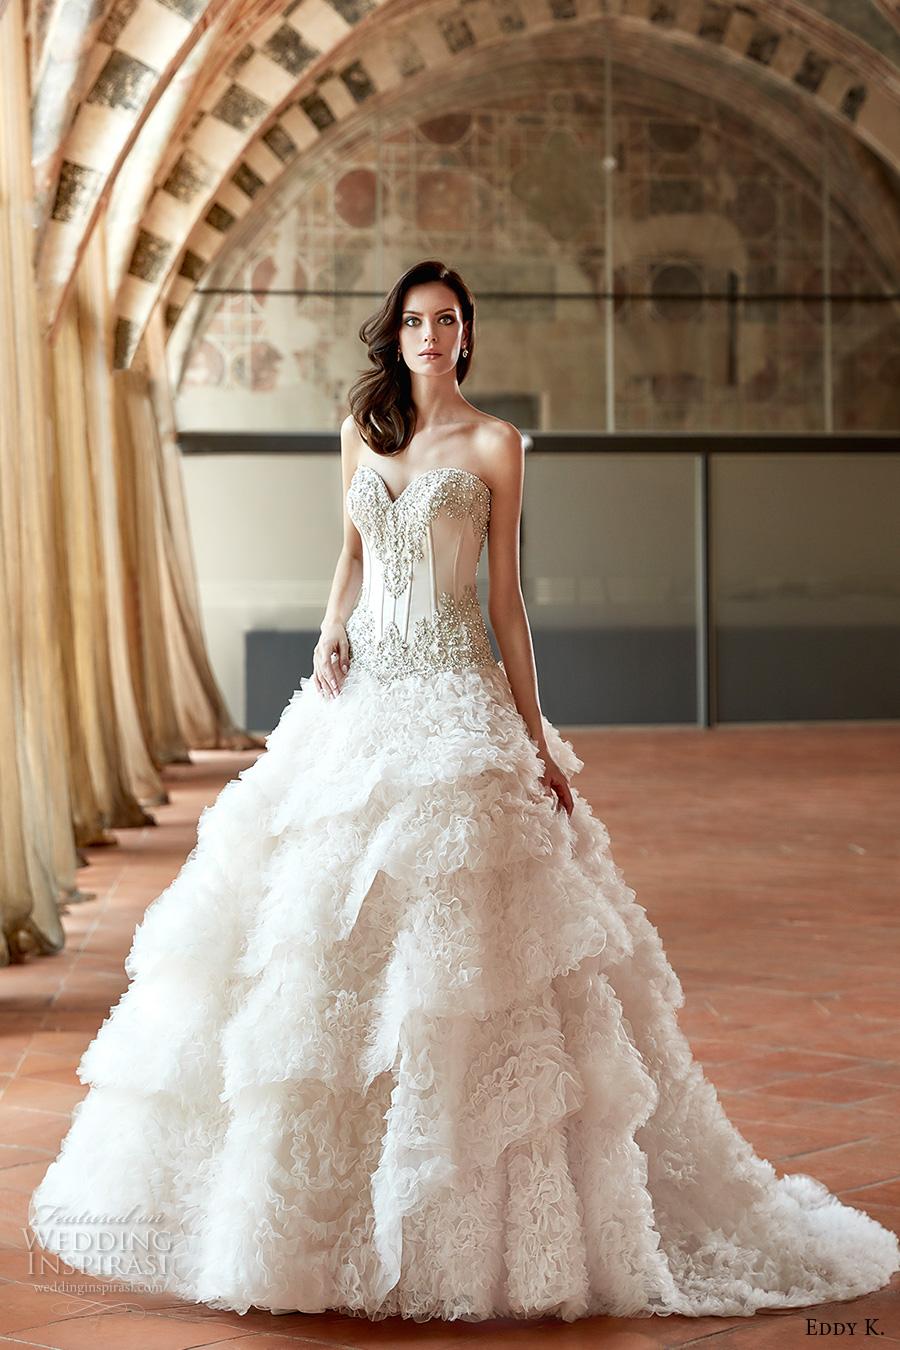 Corset Short Wedding Dress 61 Ideal eddy k couture bridal